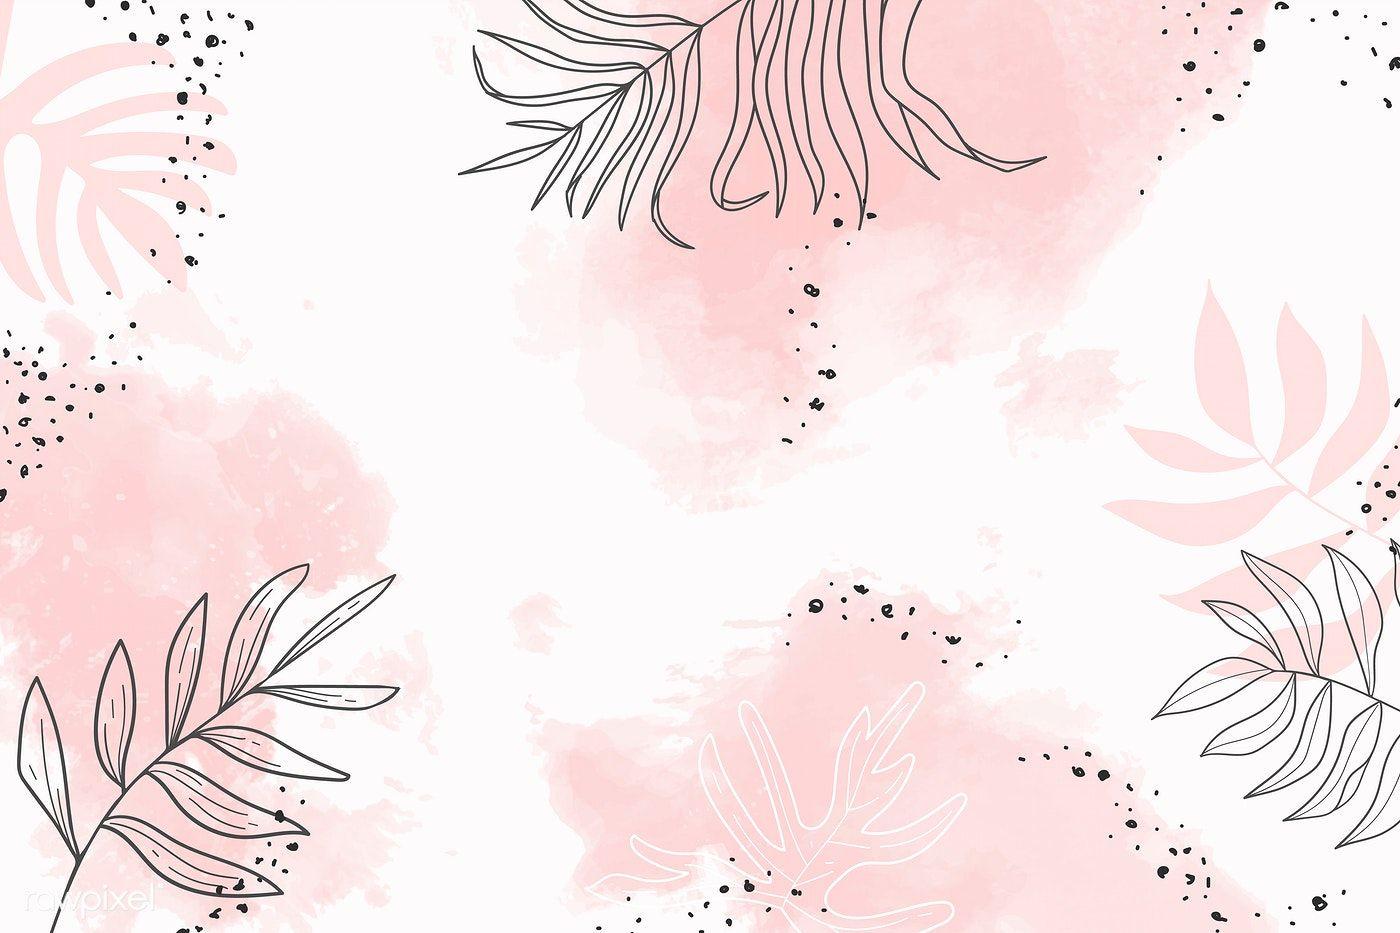 Pink Leafy Watercolor Background Vector Premium Image By Rawpixel Com Aum Cute Desktop Wallpaper Pink Wallpaper Laptop Desktop Wallpaper Art